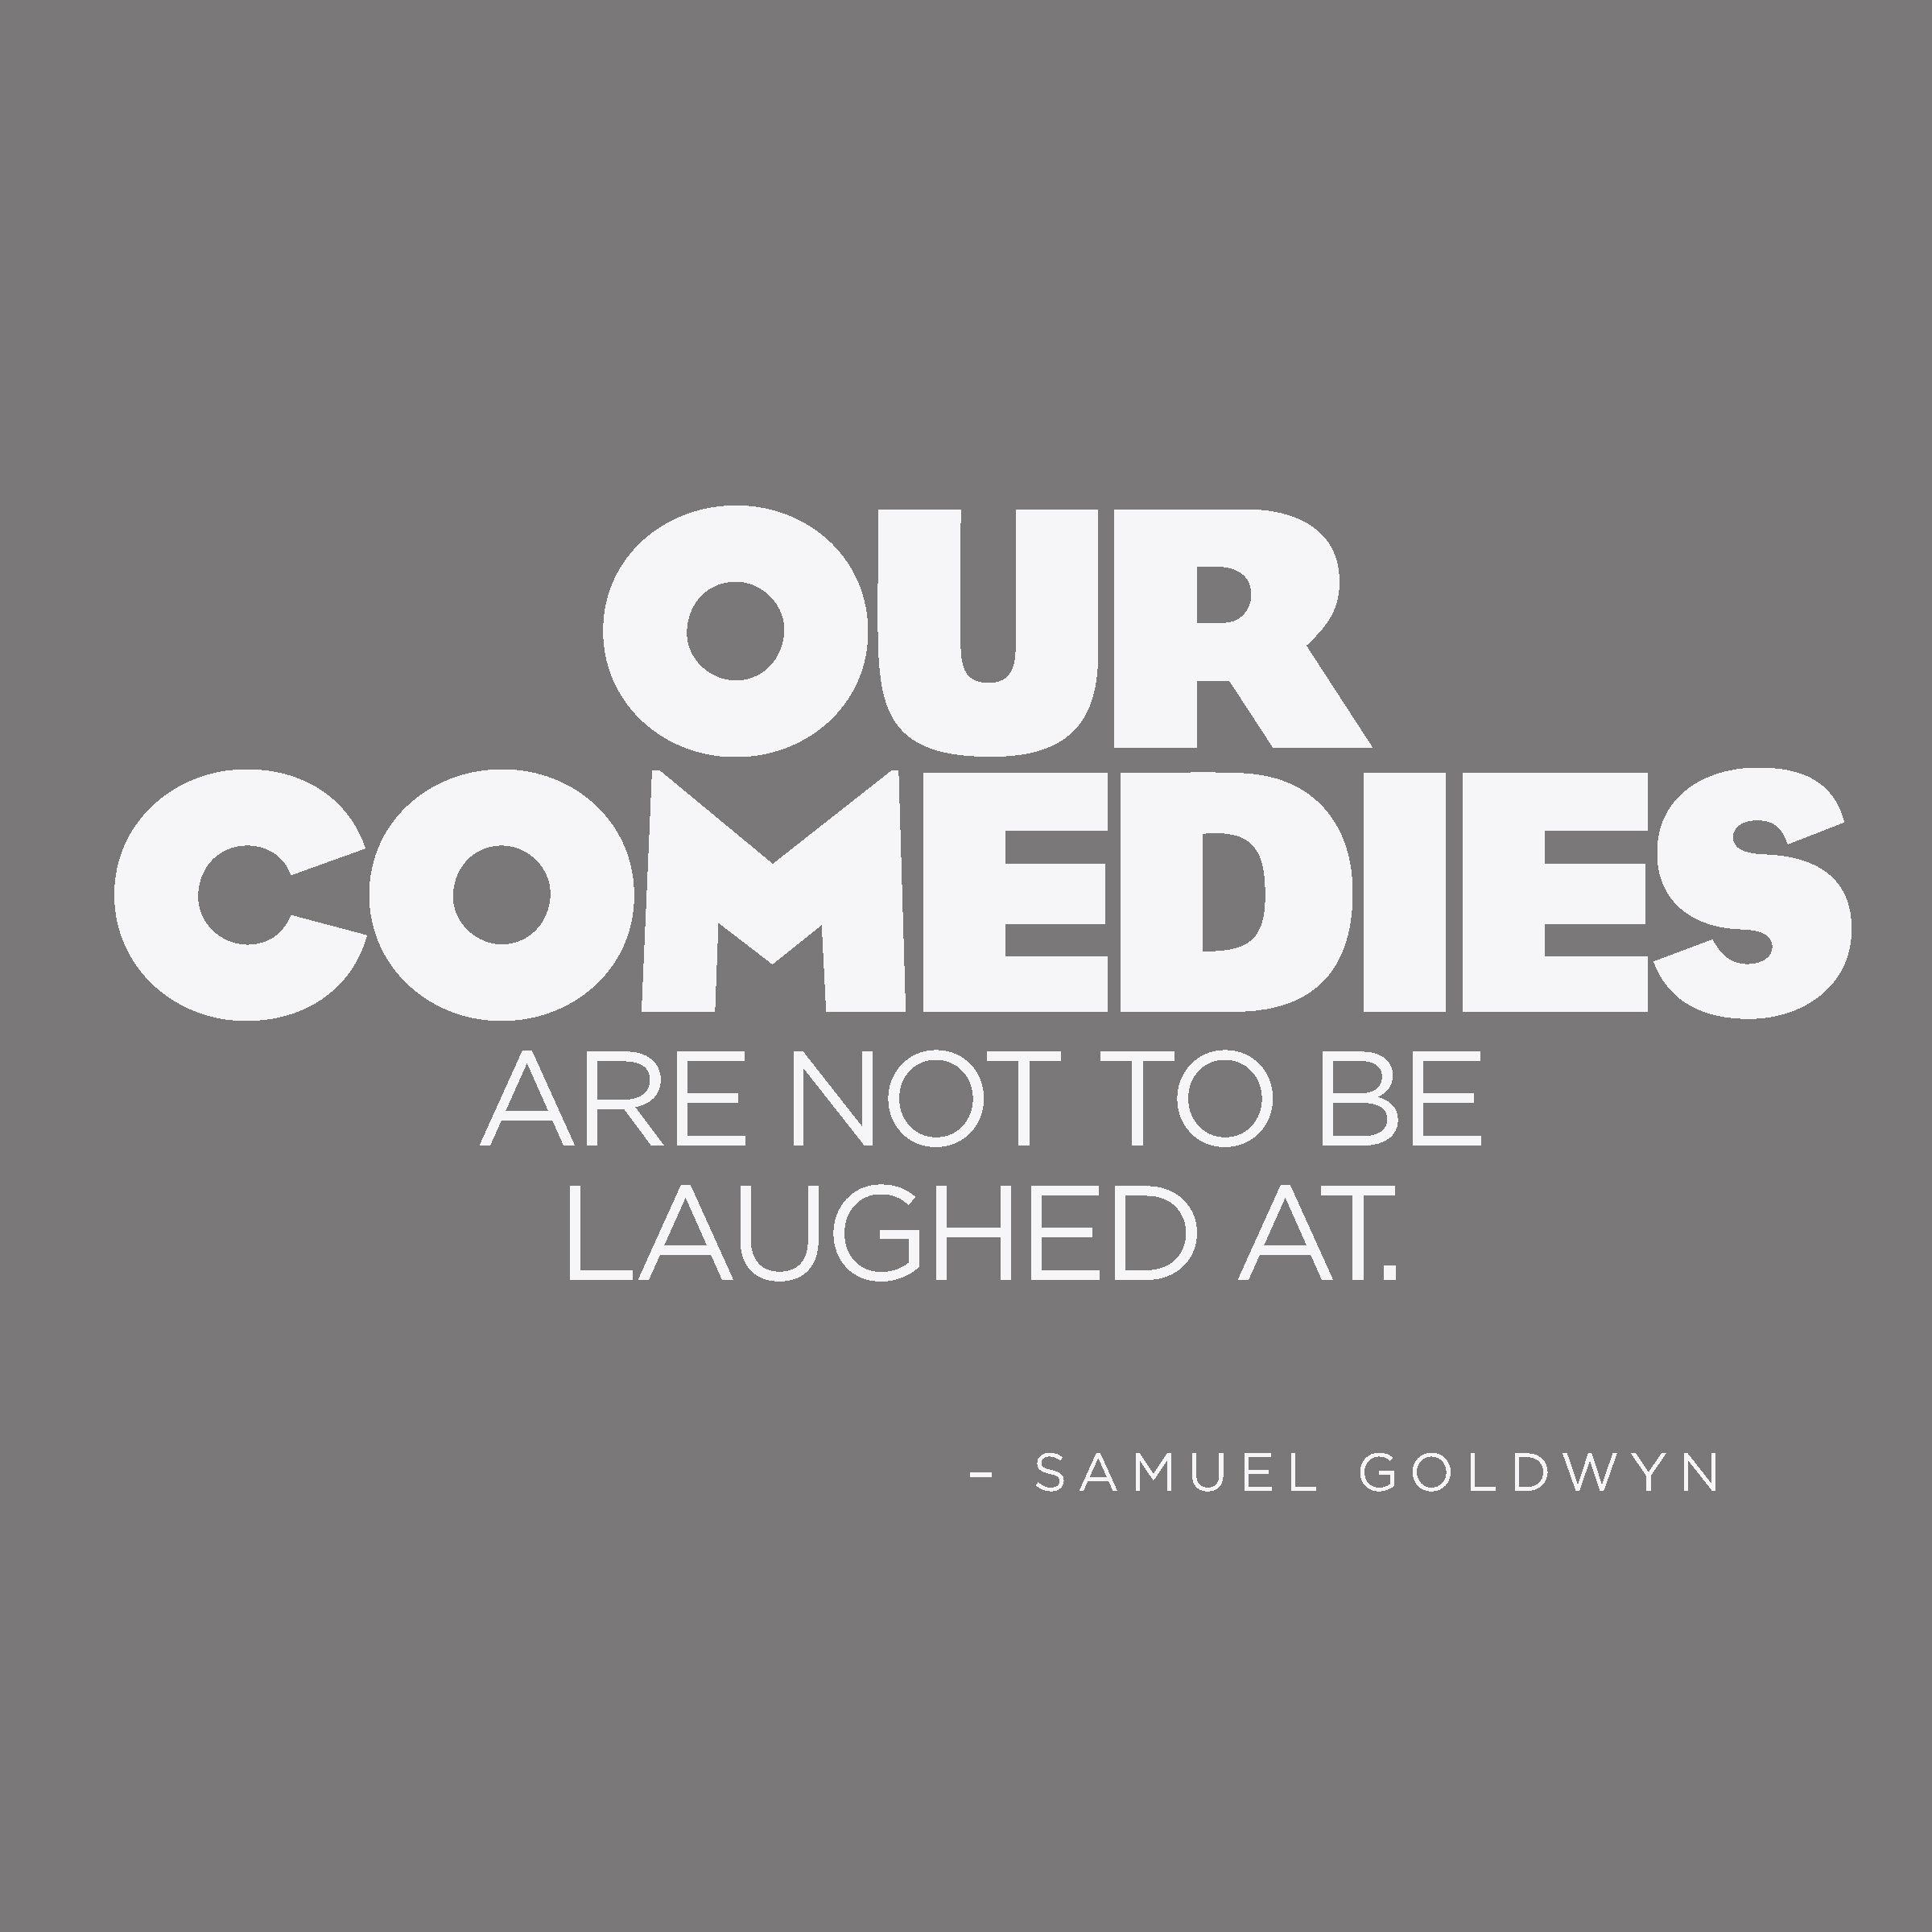 Samuel Goldwyn quote. Design quotes, Quotable quotes